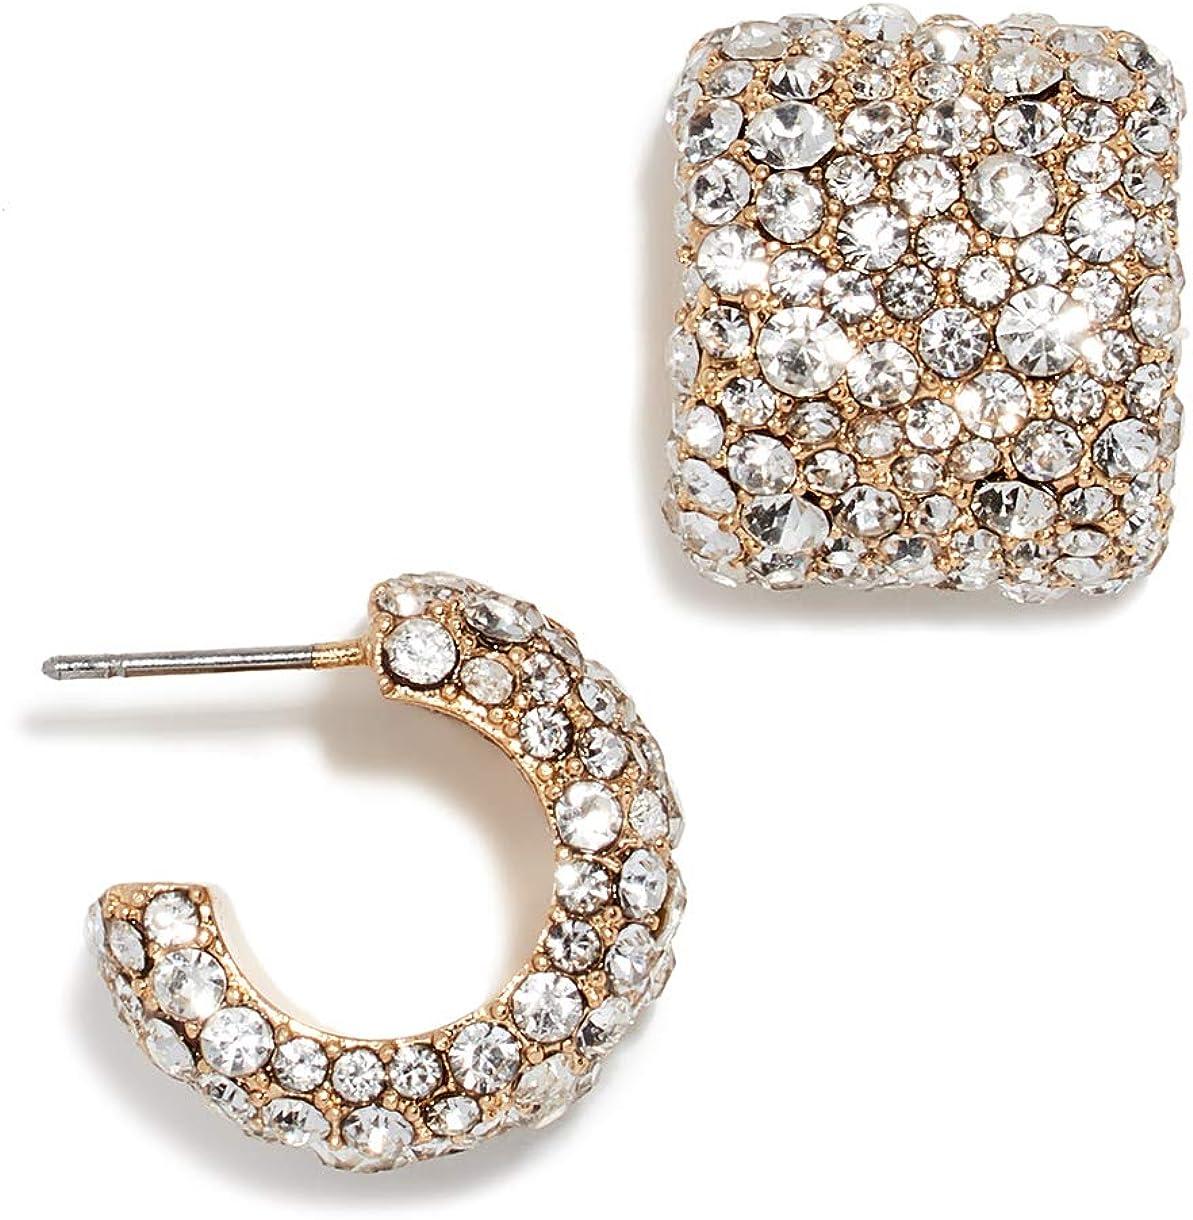 14K Gold Plated Ear Cuff Huggies Hoop Branded goods Regular discount Earrings Gl Dainty Fringe